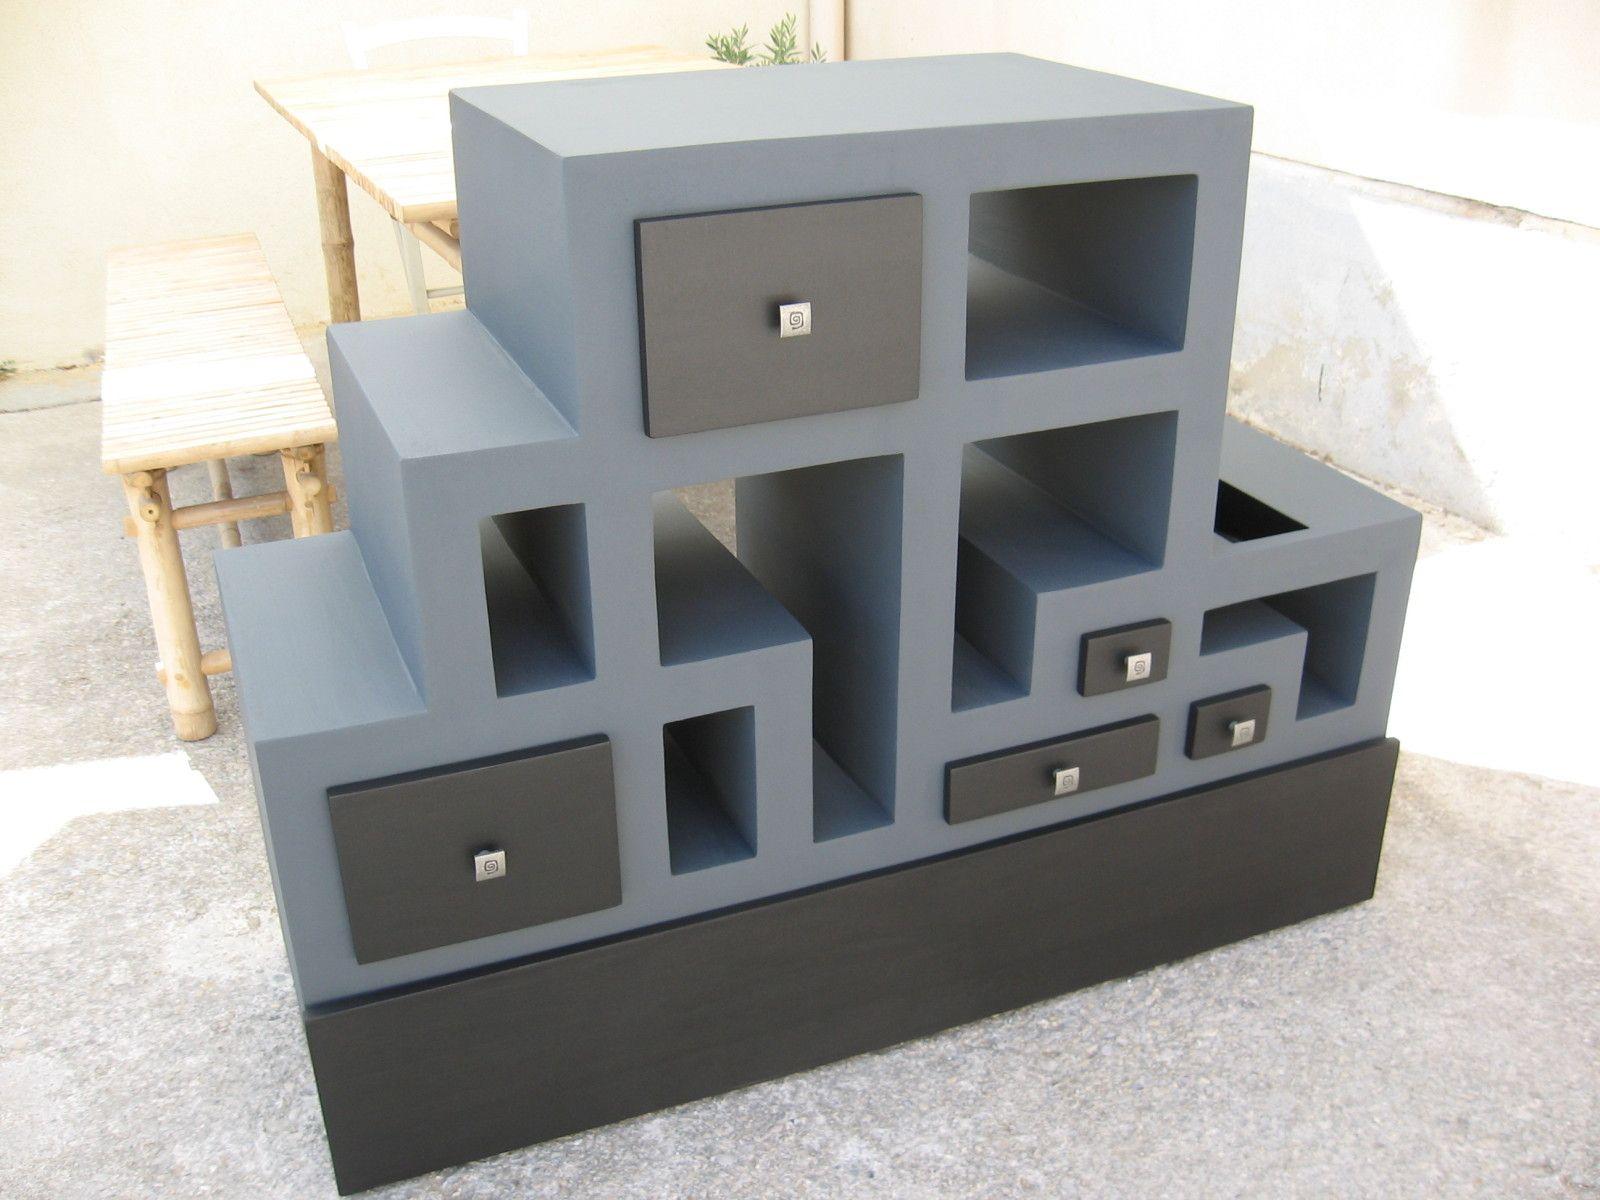 1ere Partie Du Meuble Tele En Carton Termine Meubles En Carton Marie Krtonne Cardboard Furniture Cardboard Design Paper Furniture